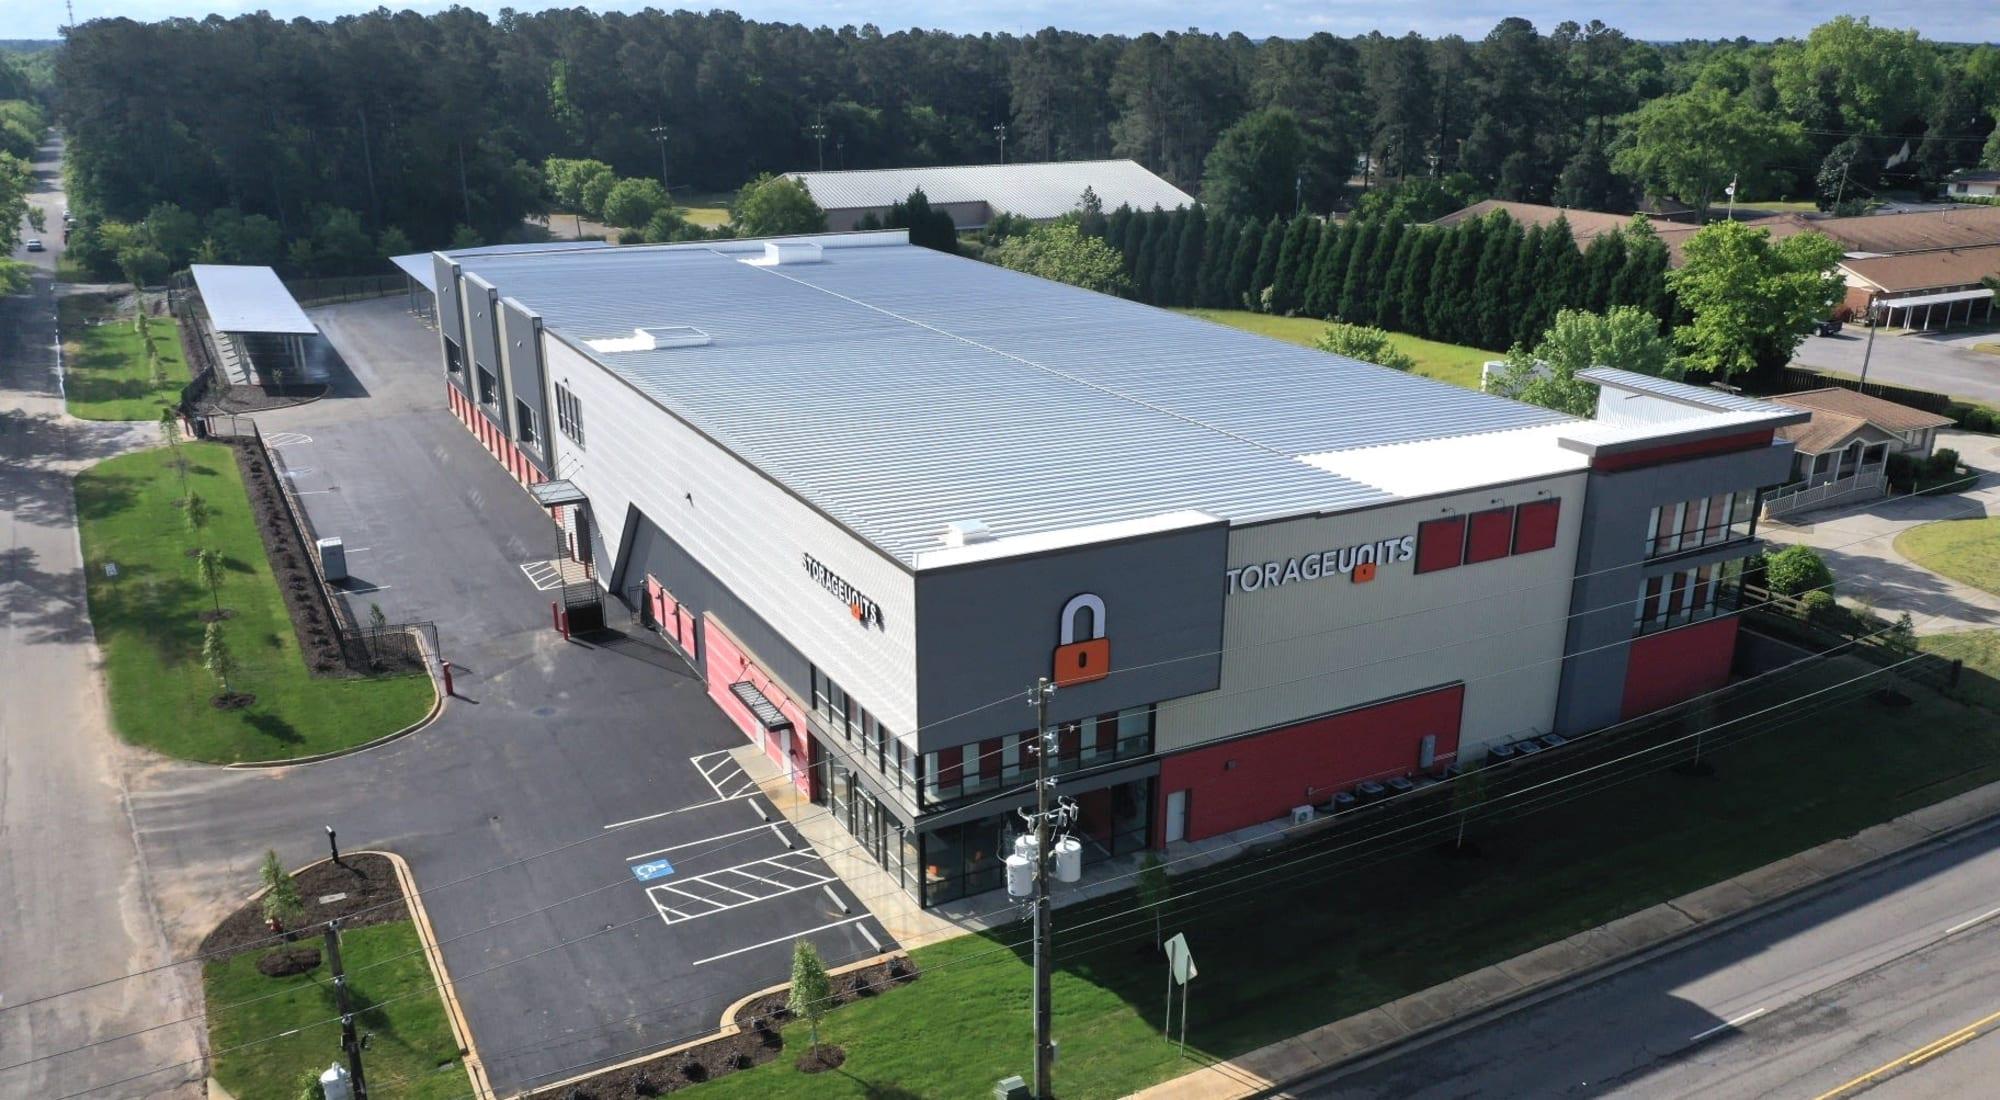 Temperature-controlled storage at Storage Units in Aiken, South Carolina